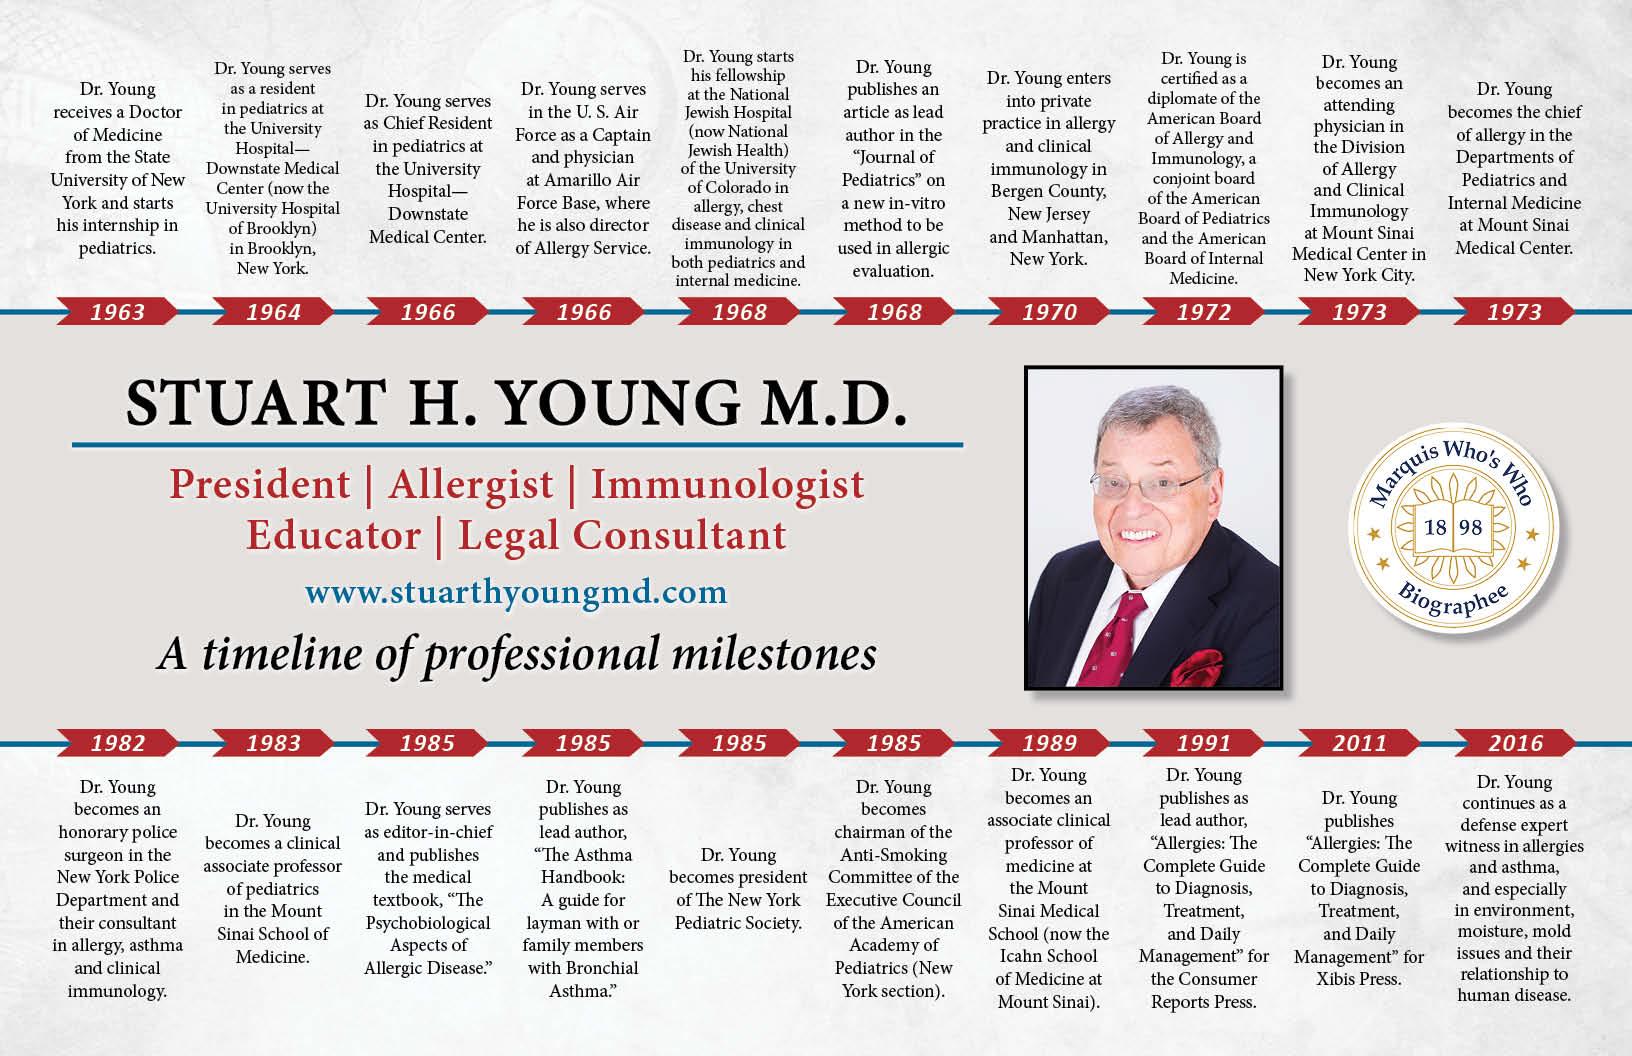 Stuart Young Professional Milestones